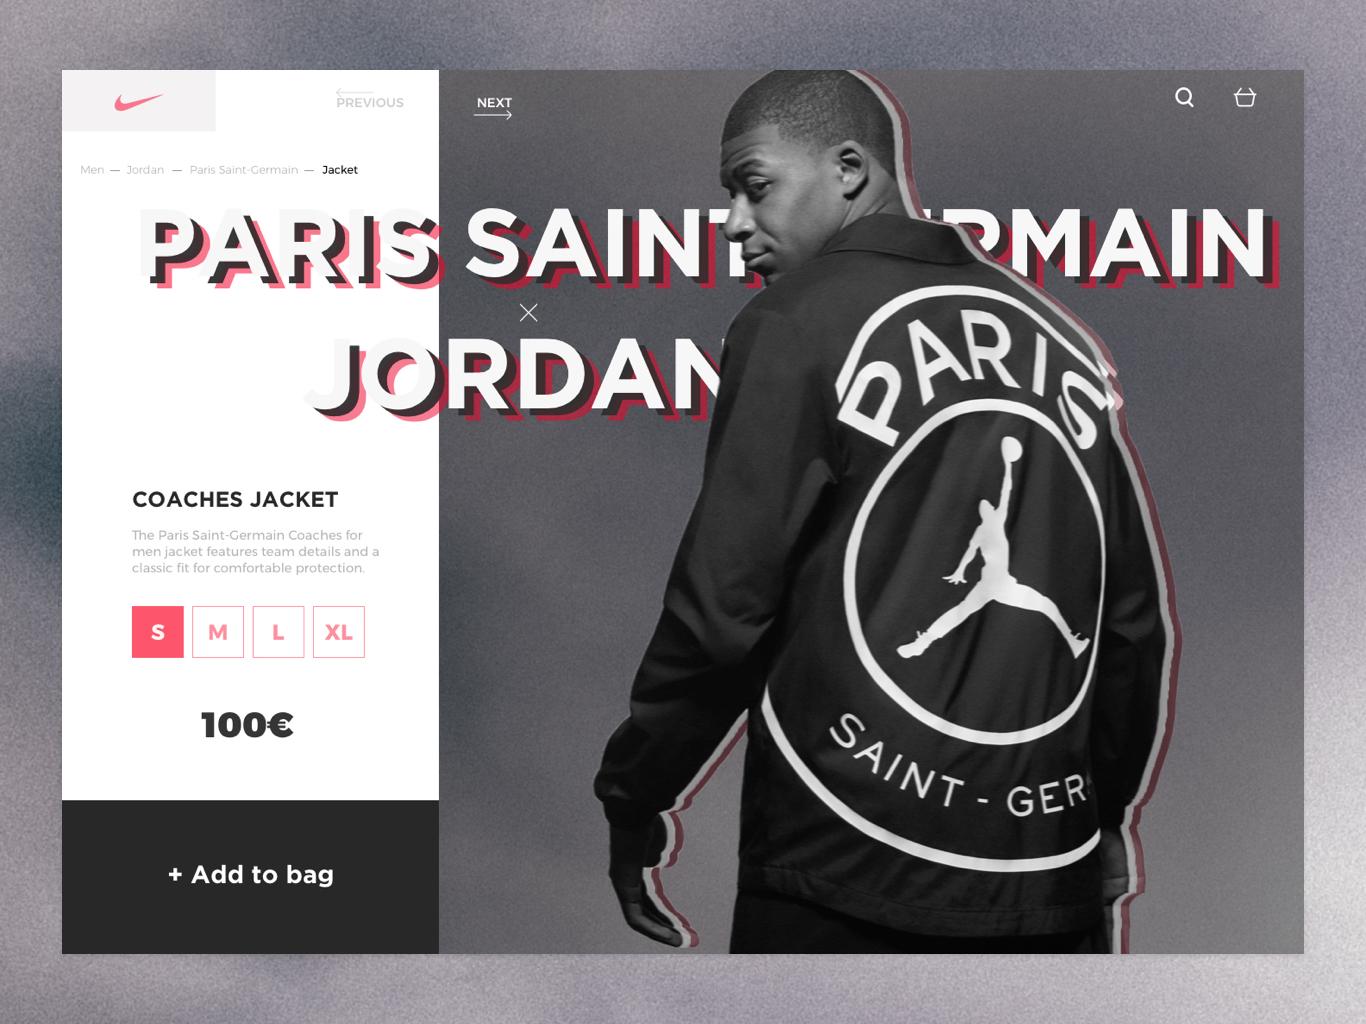 6ab6fb50 Jordan x PSG product page concept kylian mbappé mbappé soccer nike jordan  ux ui webdesign interface